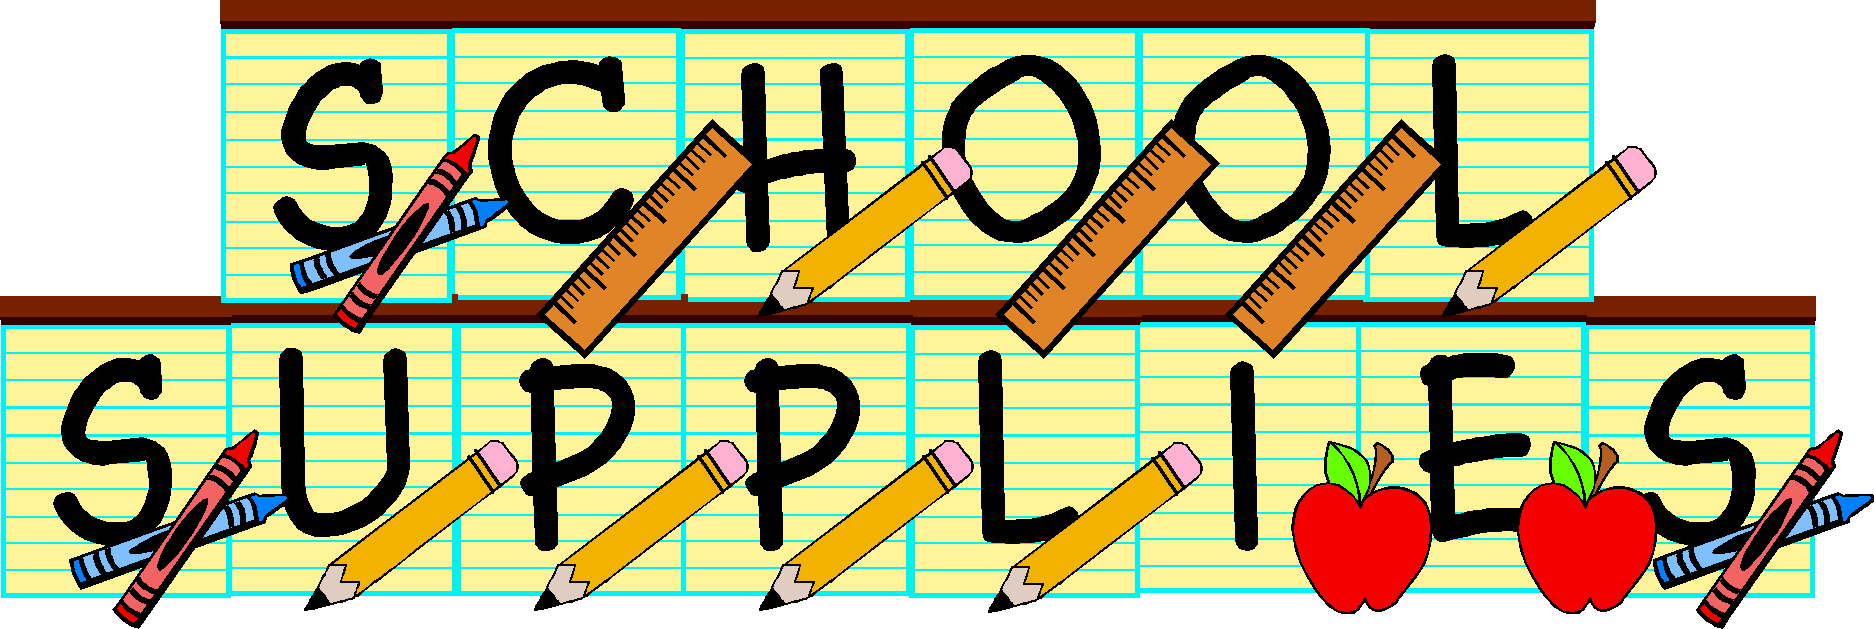 School supplies drive clipart 2